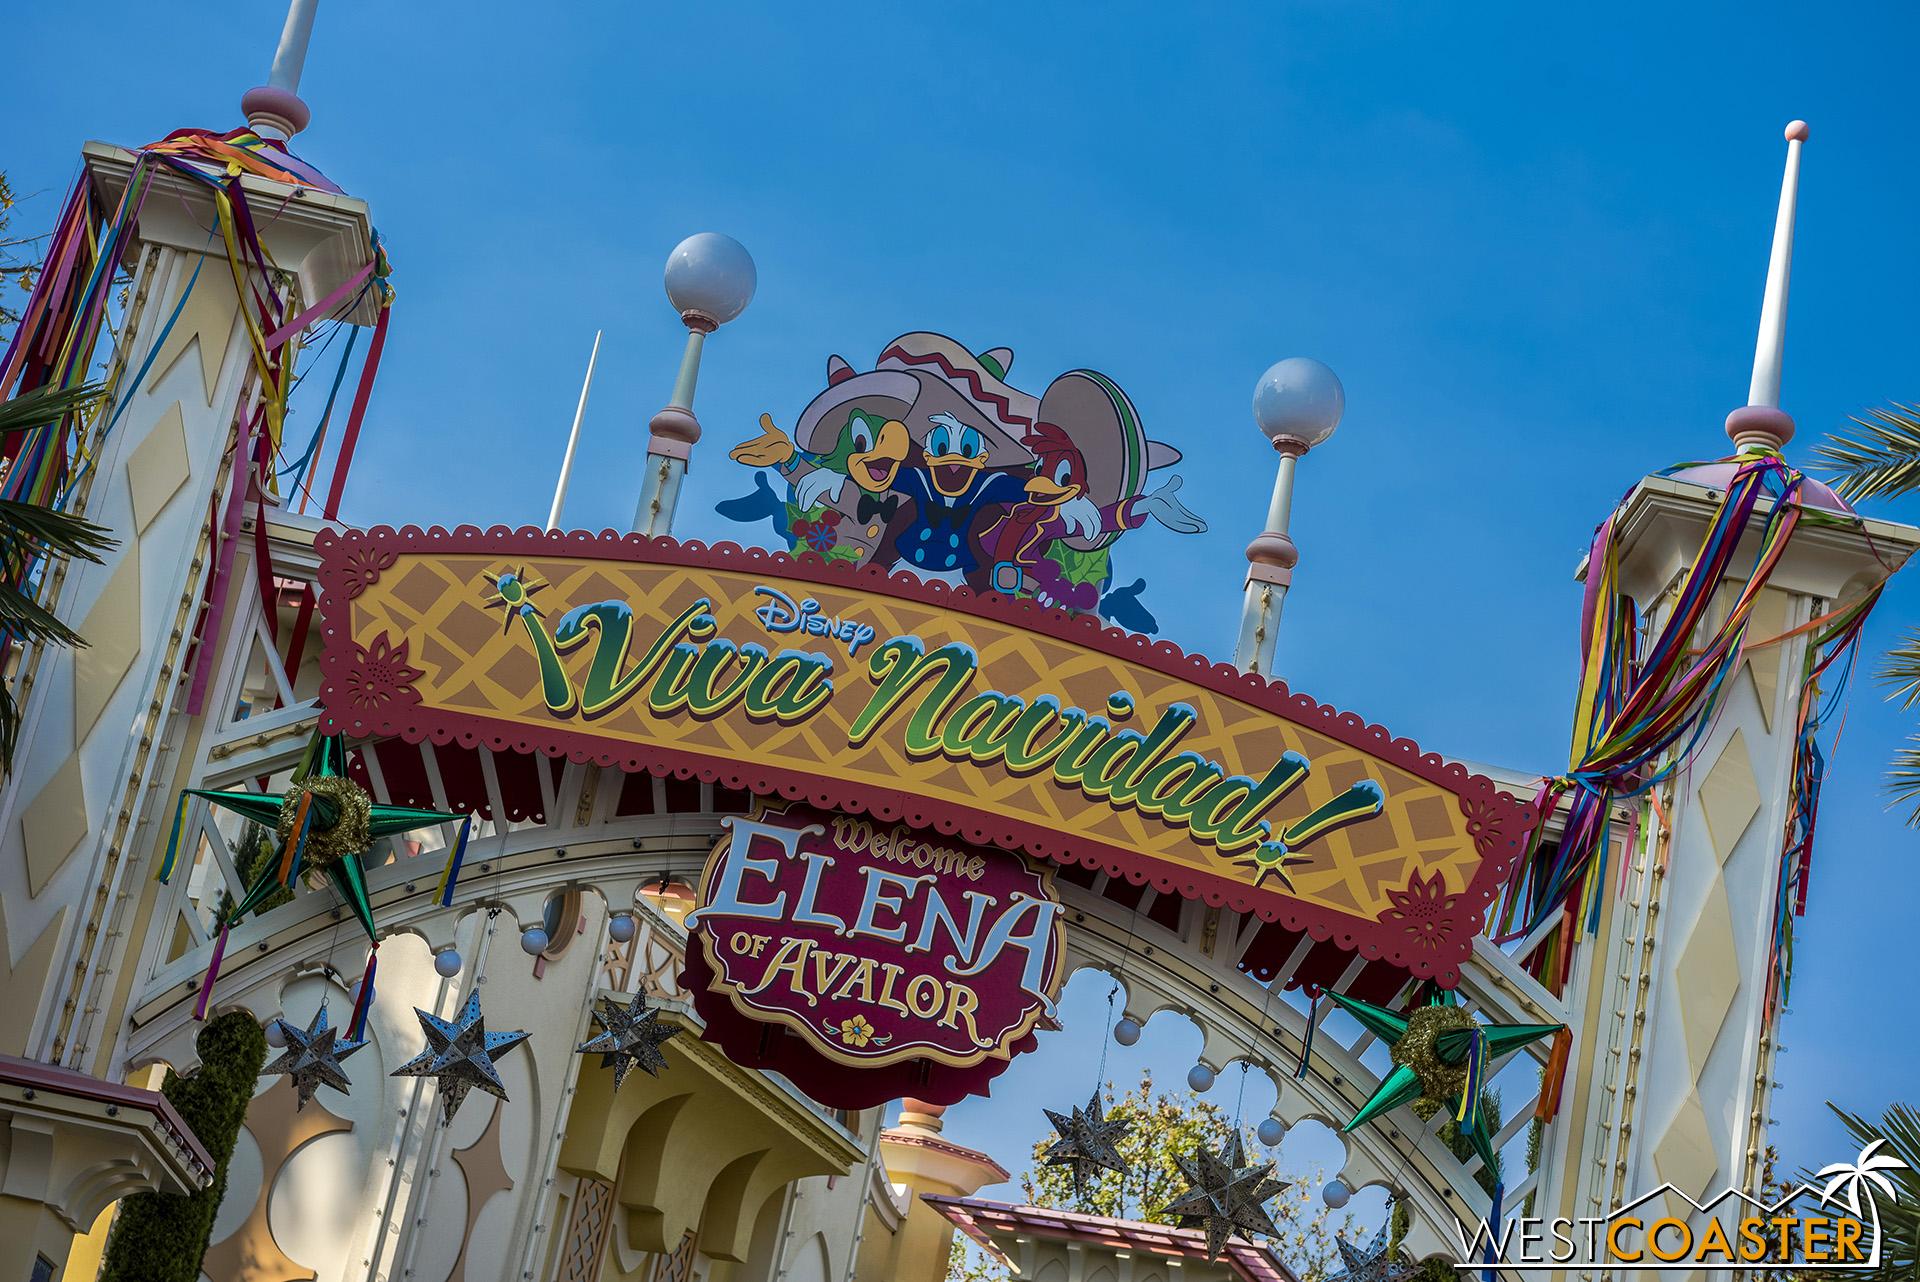 And ¡Viva Navidad! is back in its regular location over by the Boardwalk restaurants, next to Goofy's Sky School!